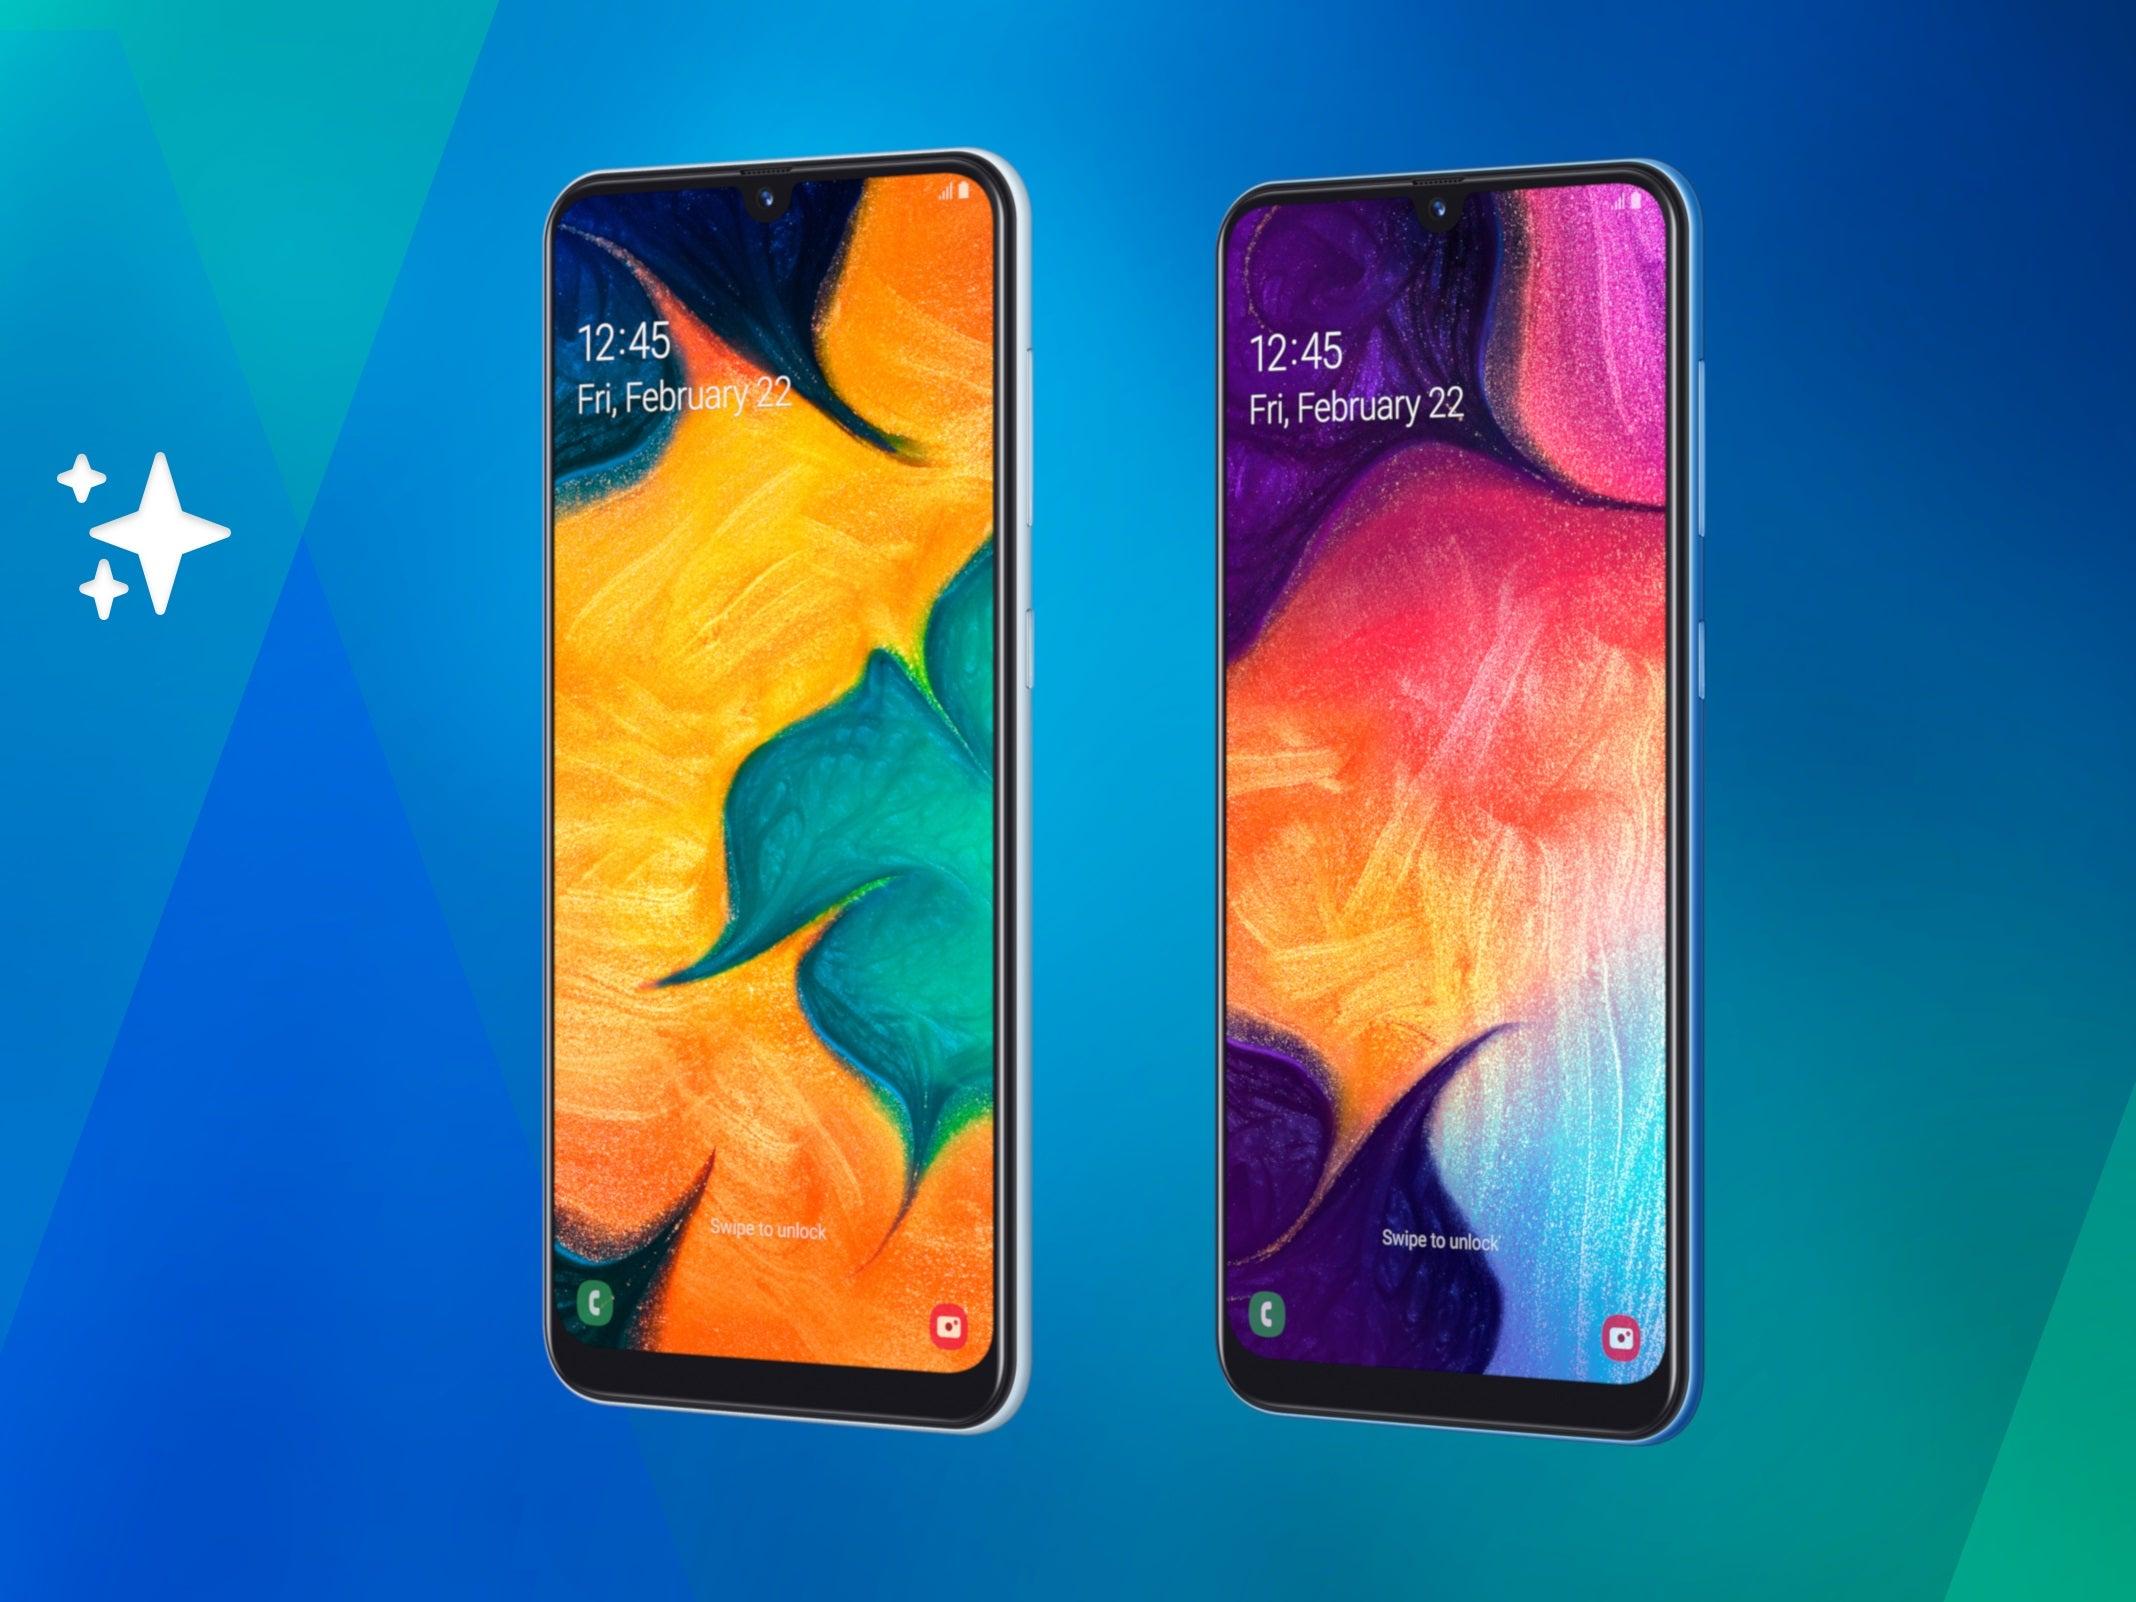 Samsung Galaxy A50 und Galaxy A30 vorgestellt